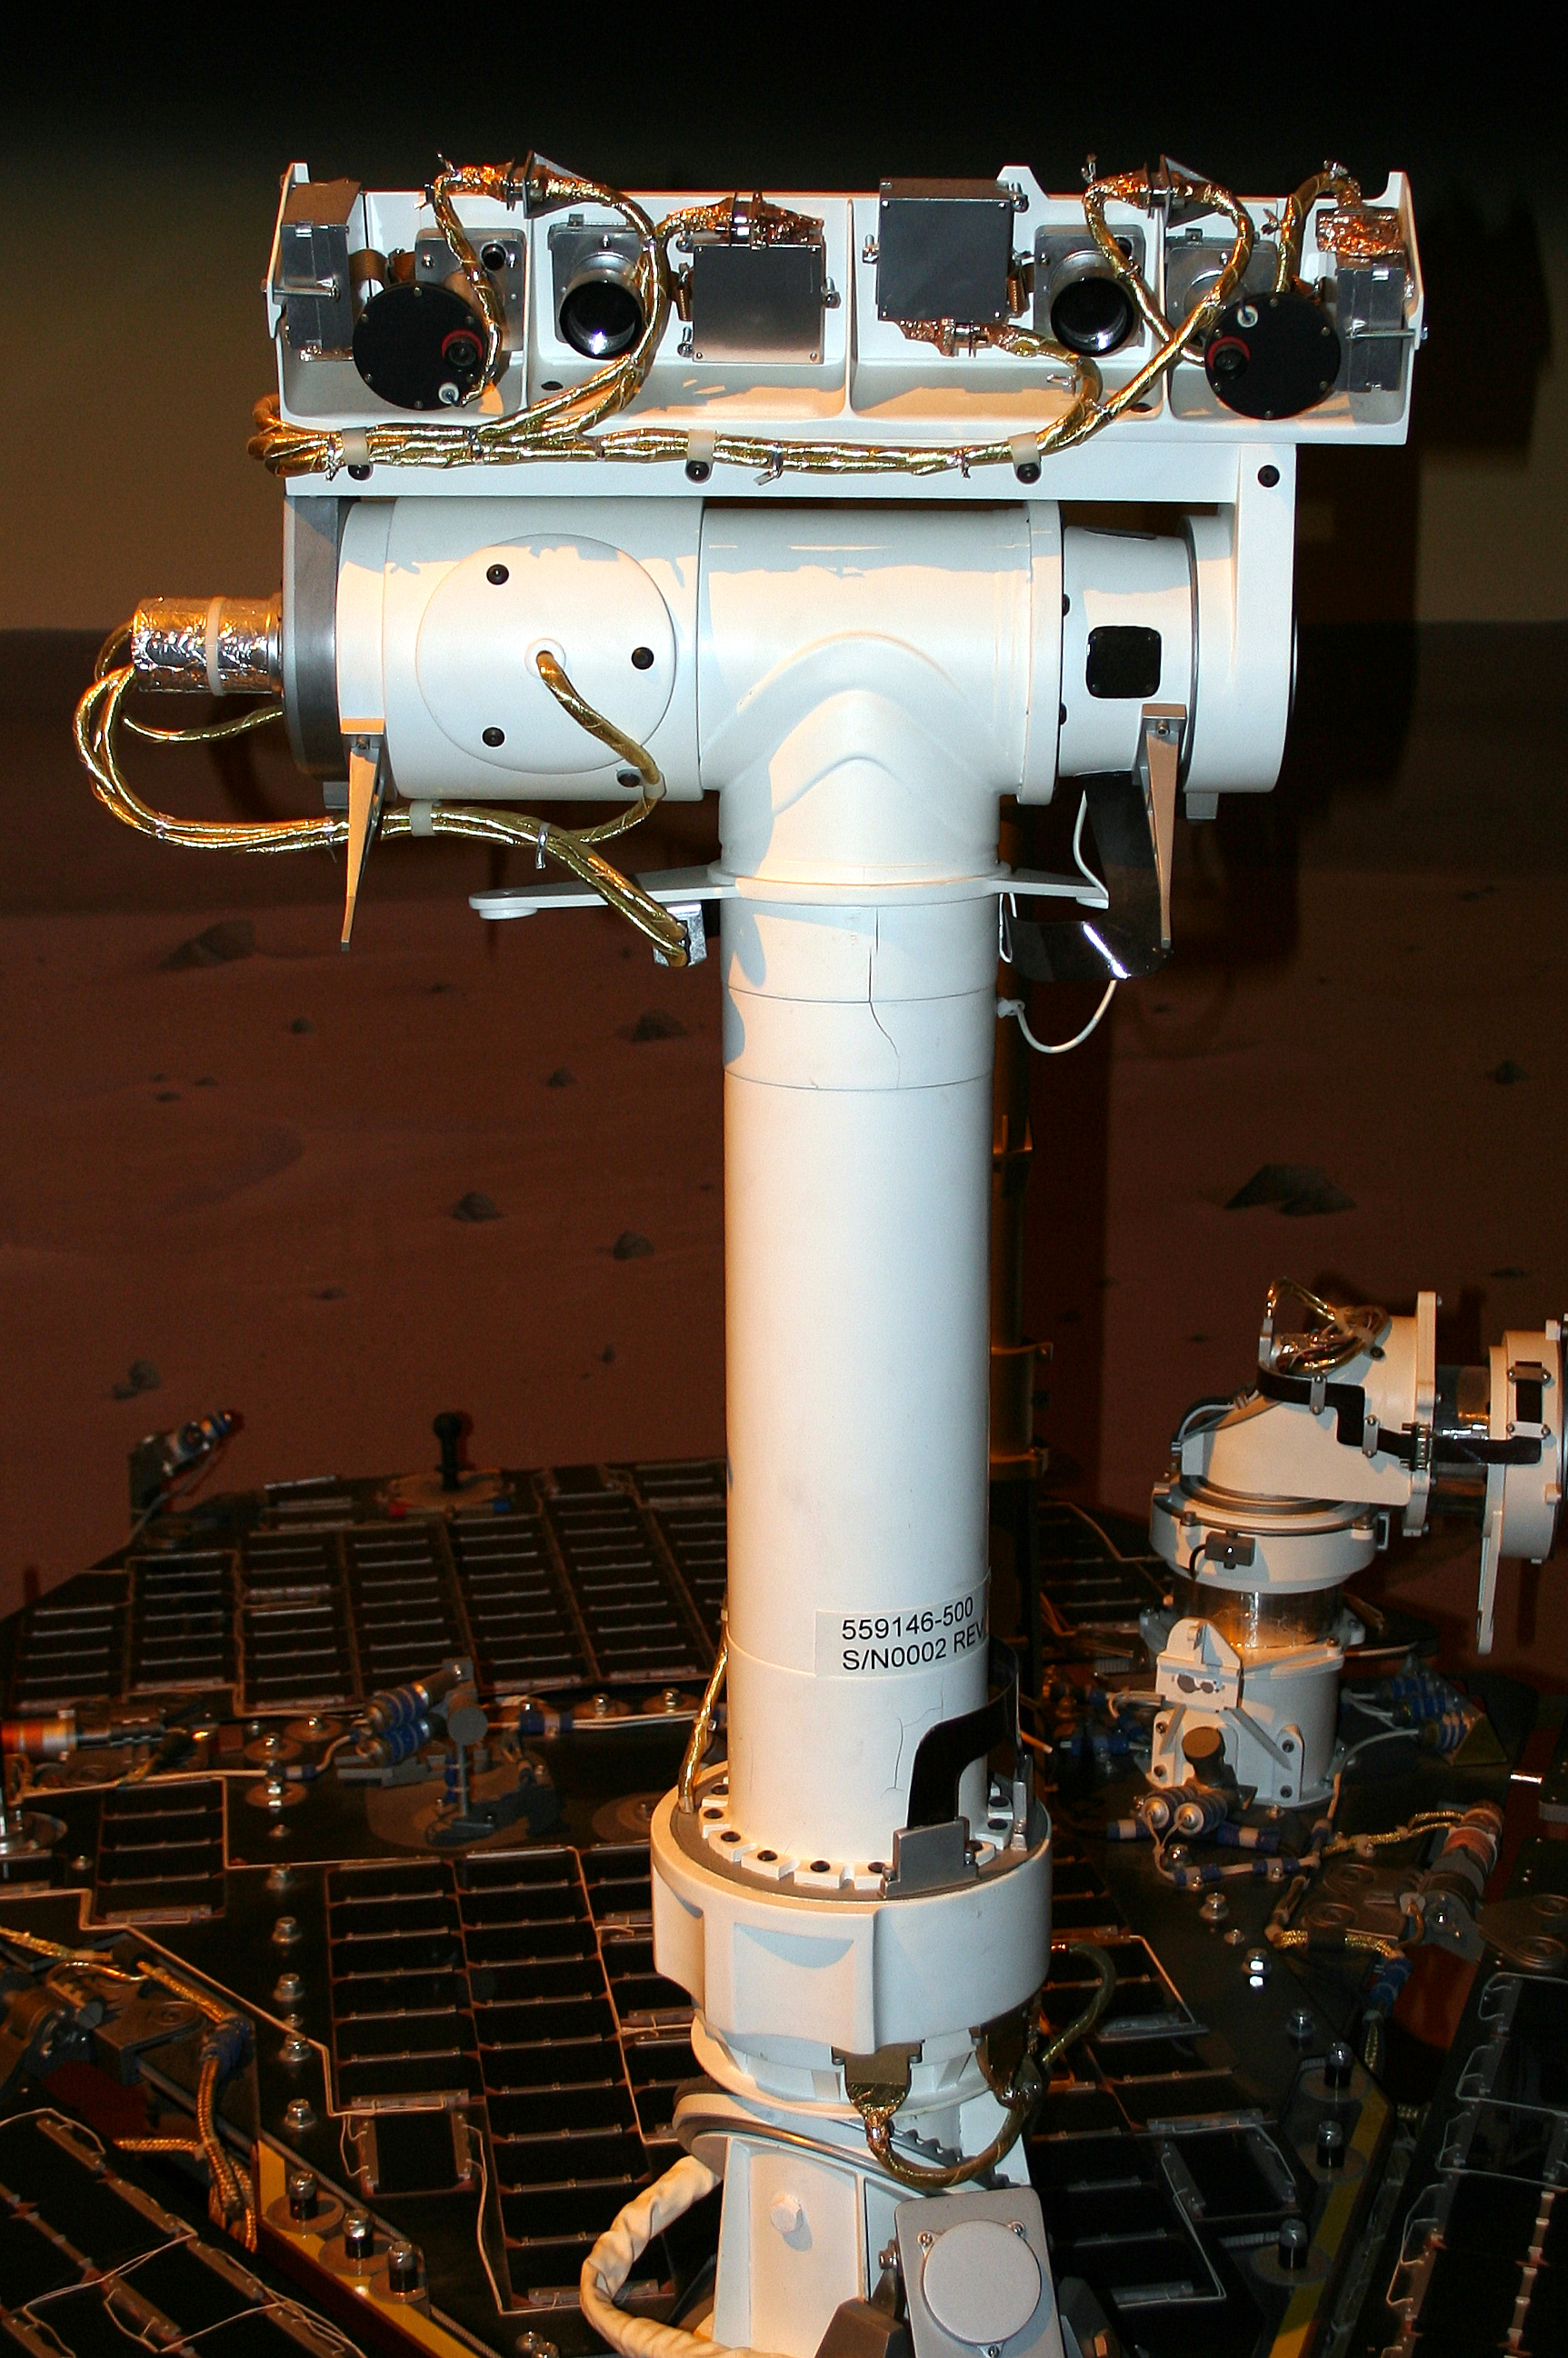 Znalezione obrazy dla zapytania: opportunity rover pancam mast assembly